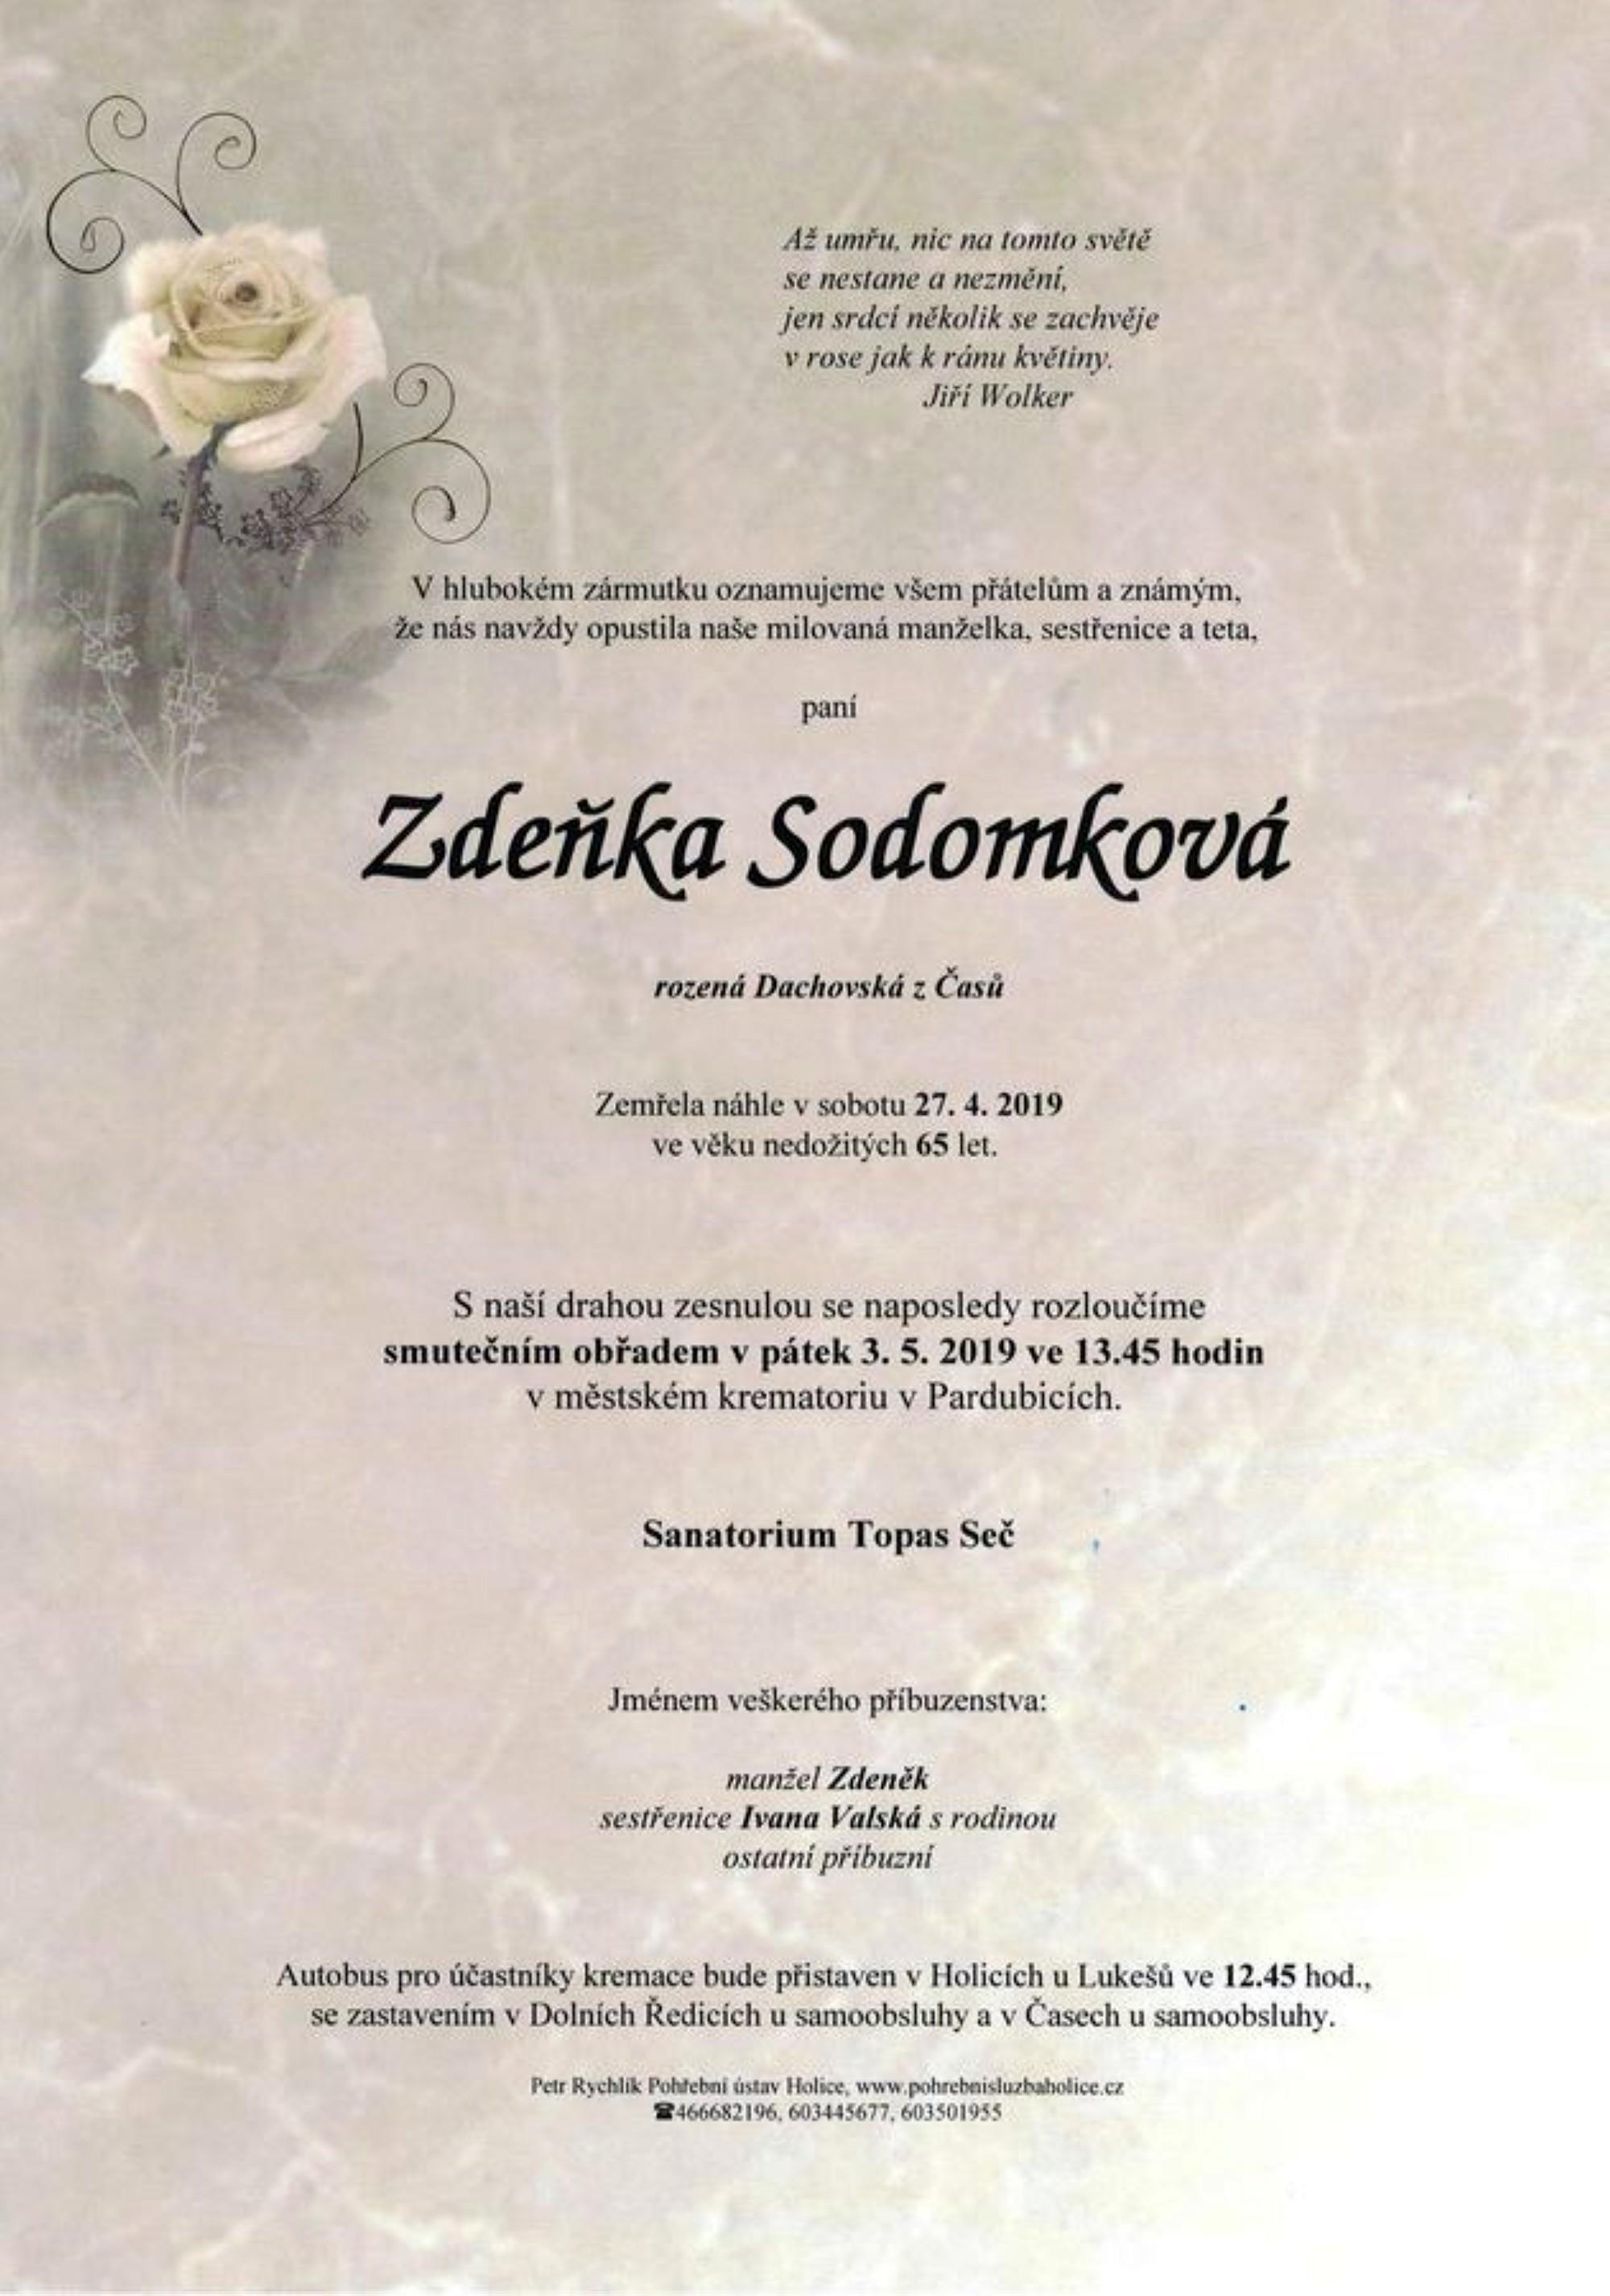 Zdeňka Sodomková